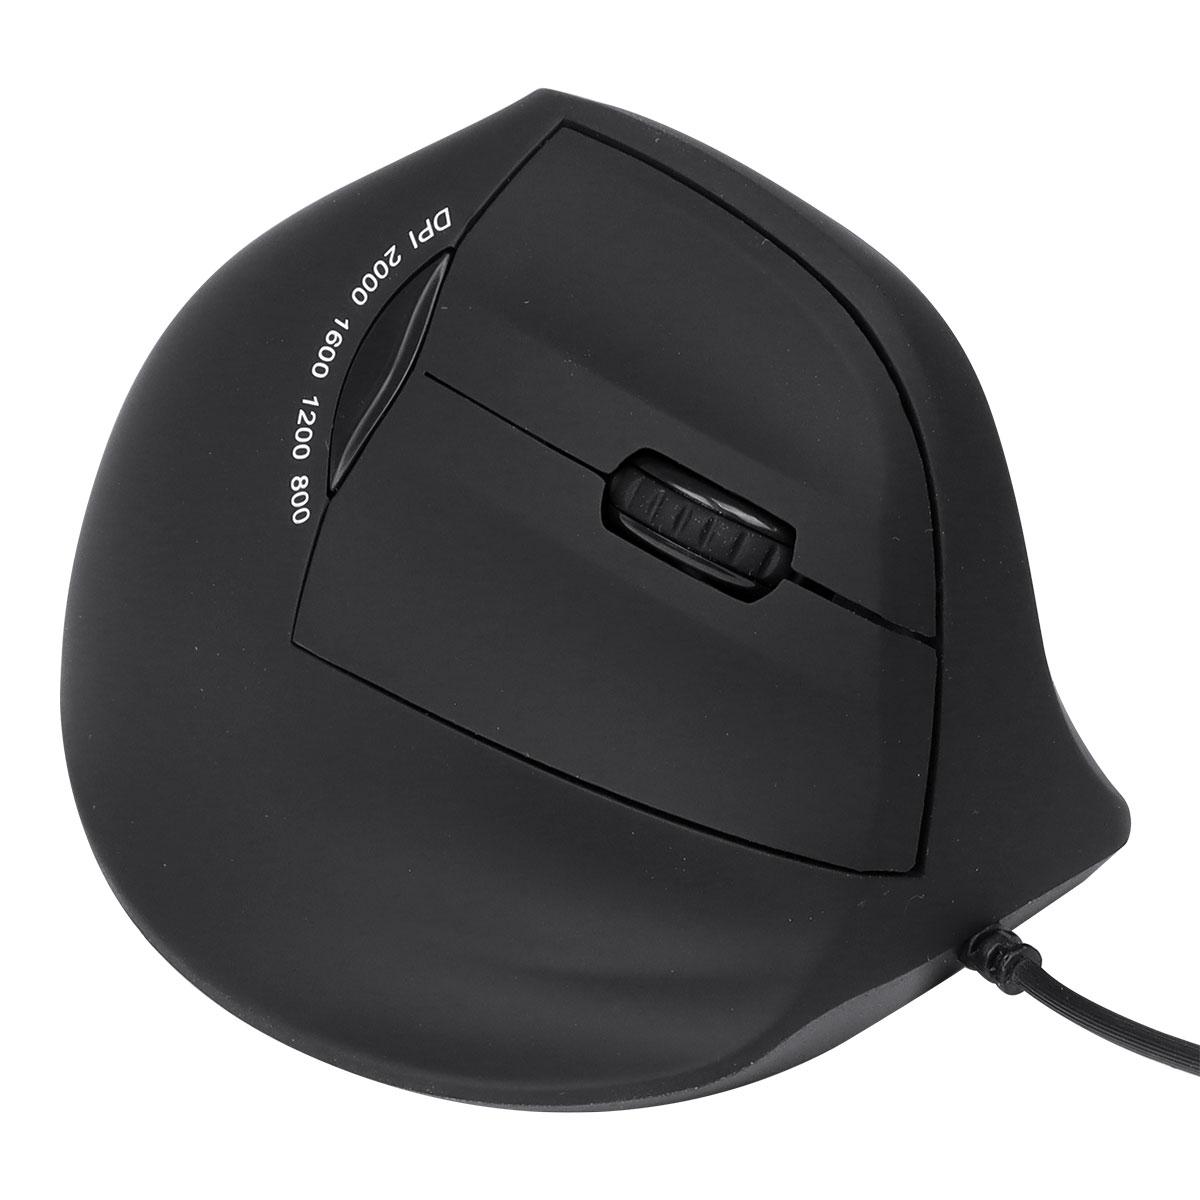 Mouse Vertical Vinik Fit Preto 1600DPI - MF100 - PC FLORIPA